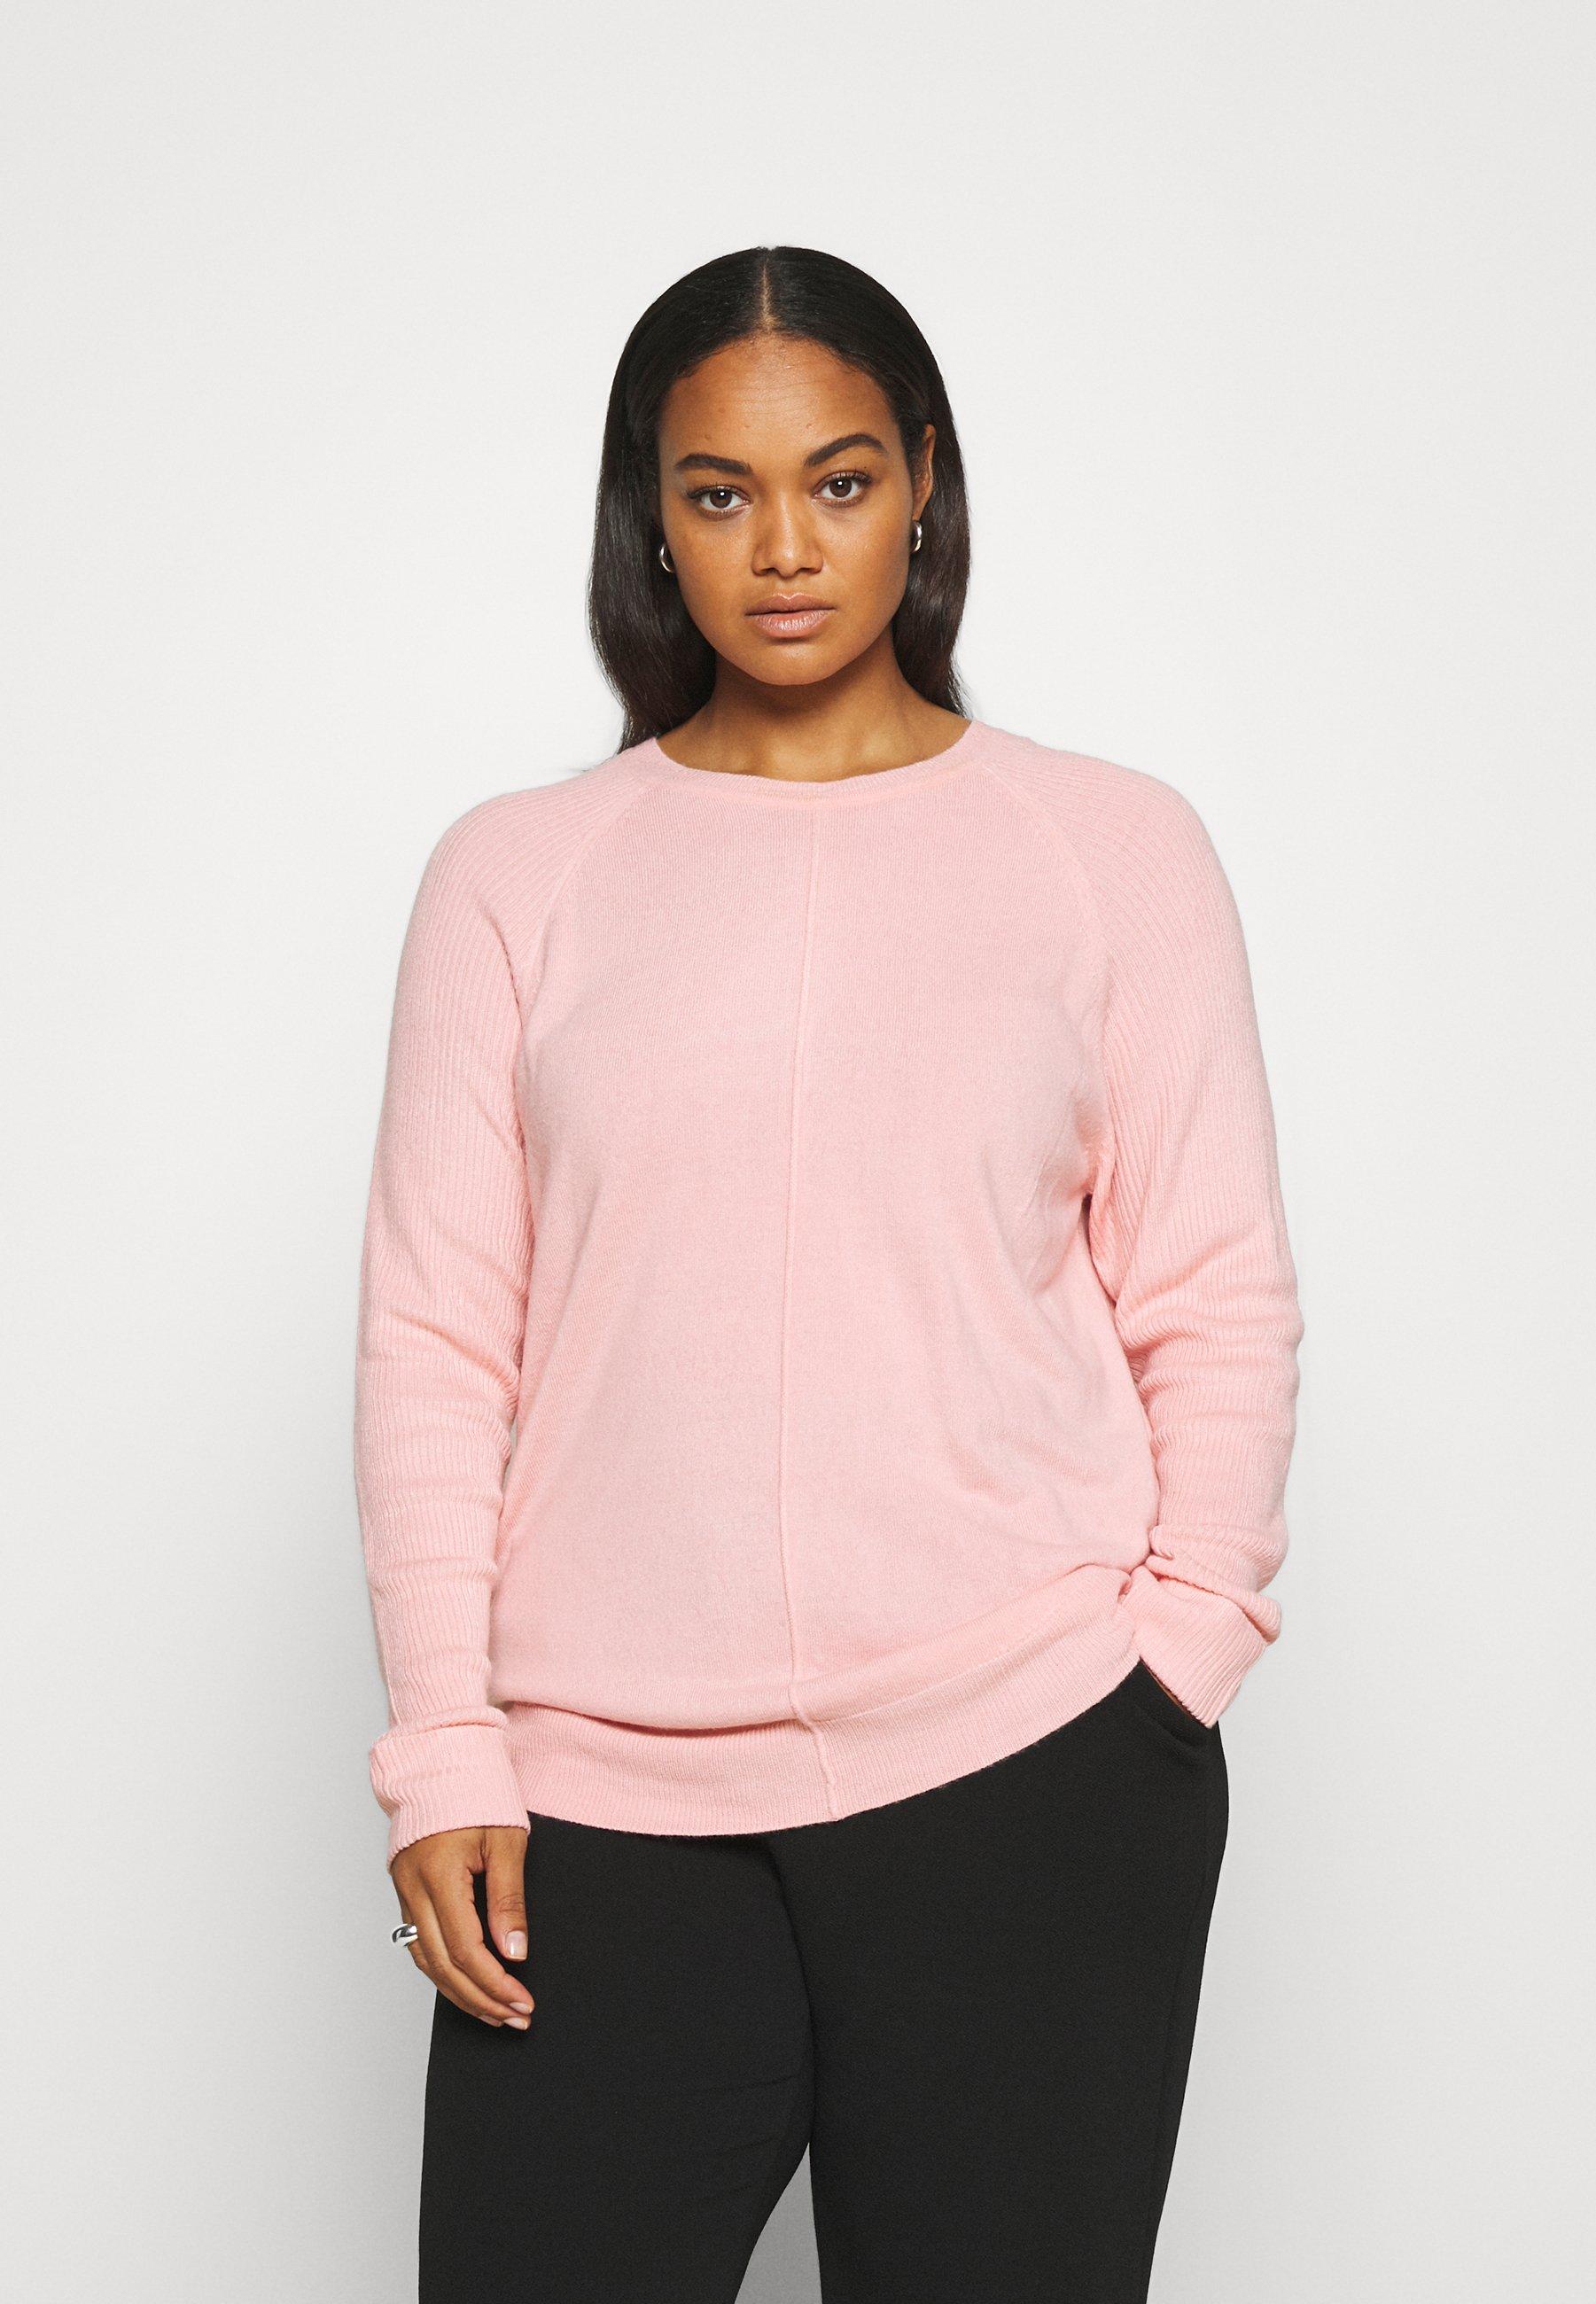 Femme CASH LIKE RIB SLEEVE JUMPER - Pullover